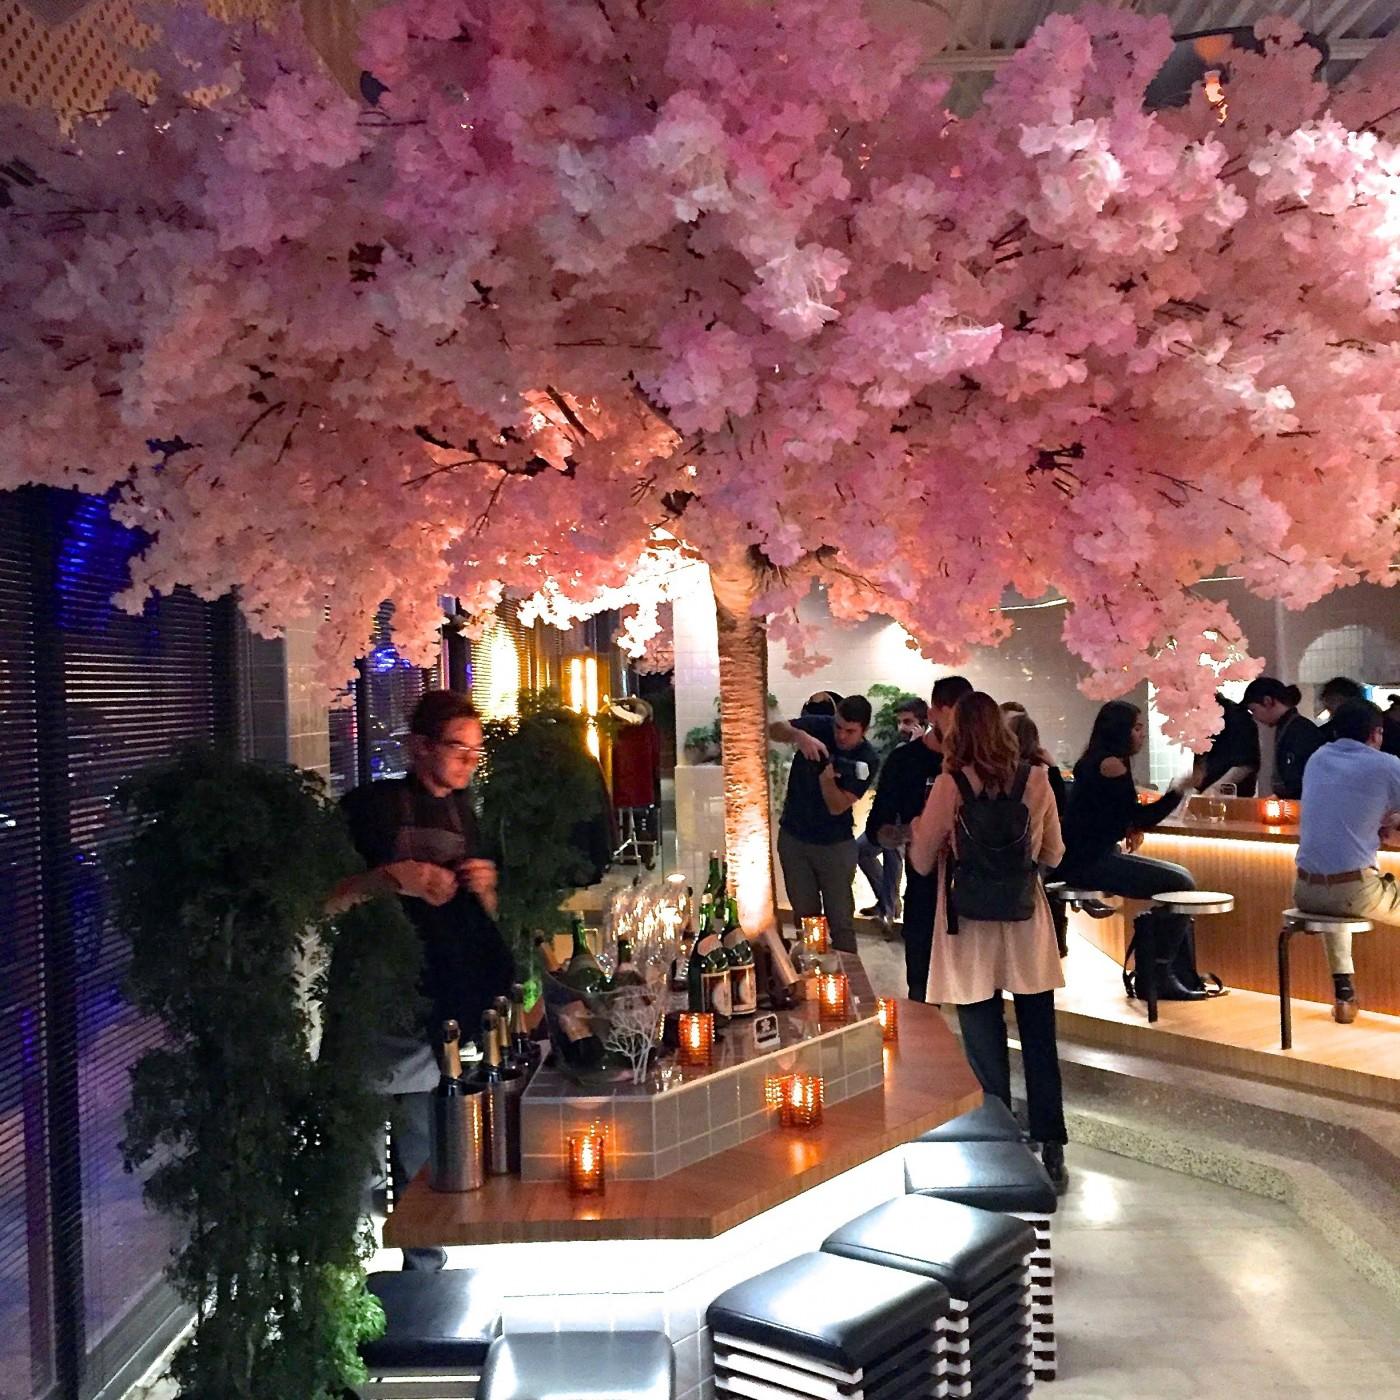 Le blossom bar izakaya montreal village japanese pub 1